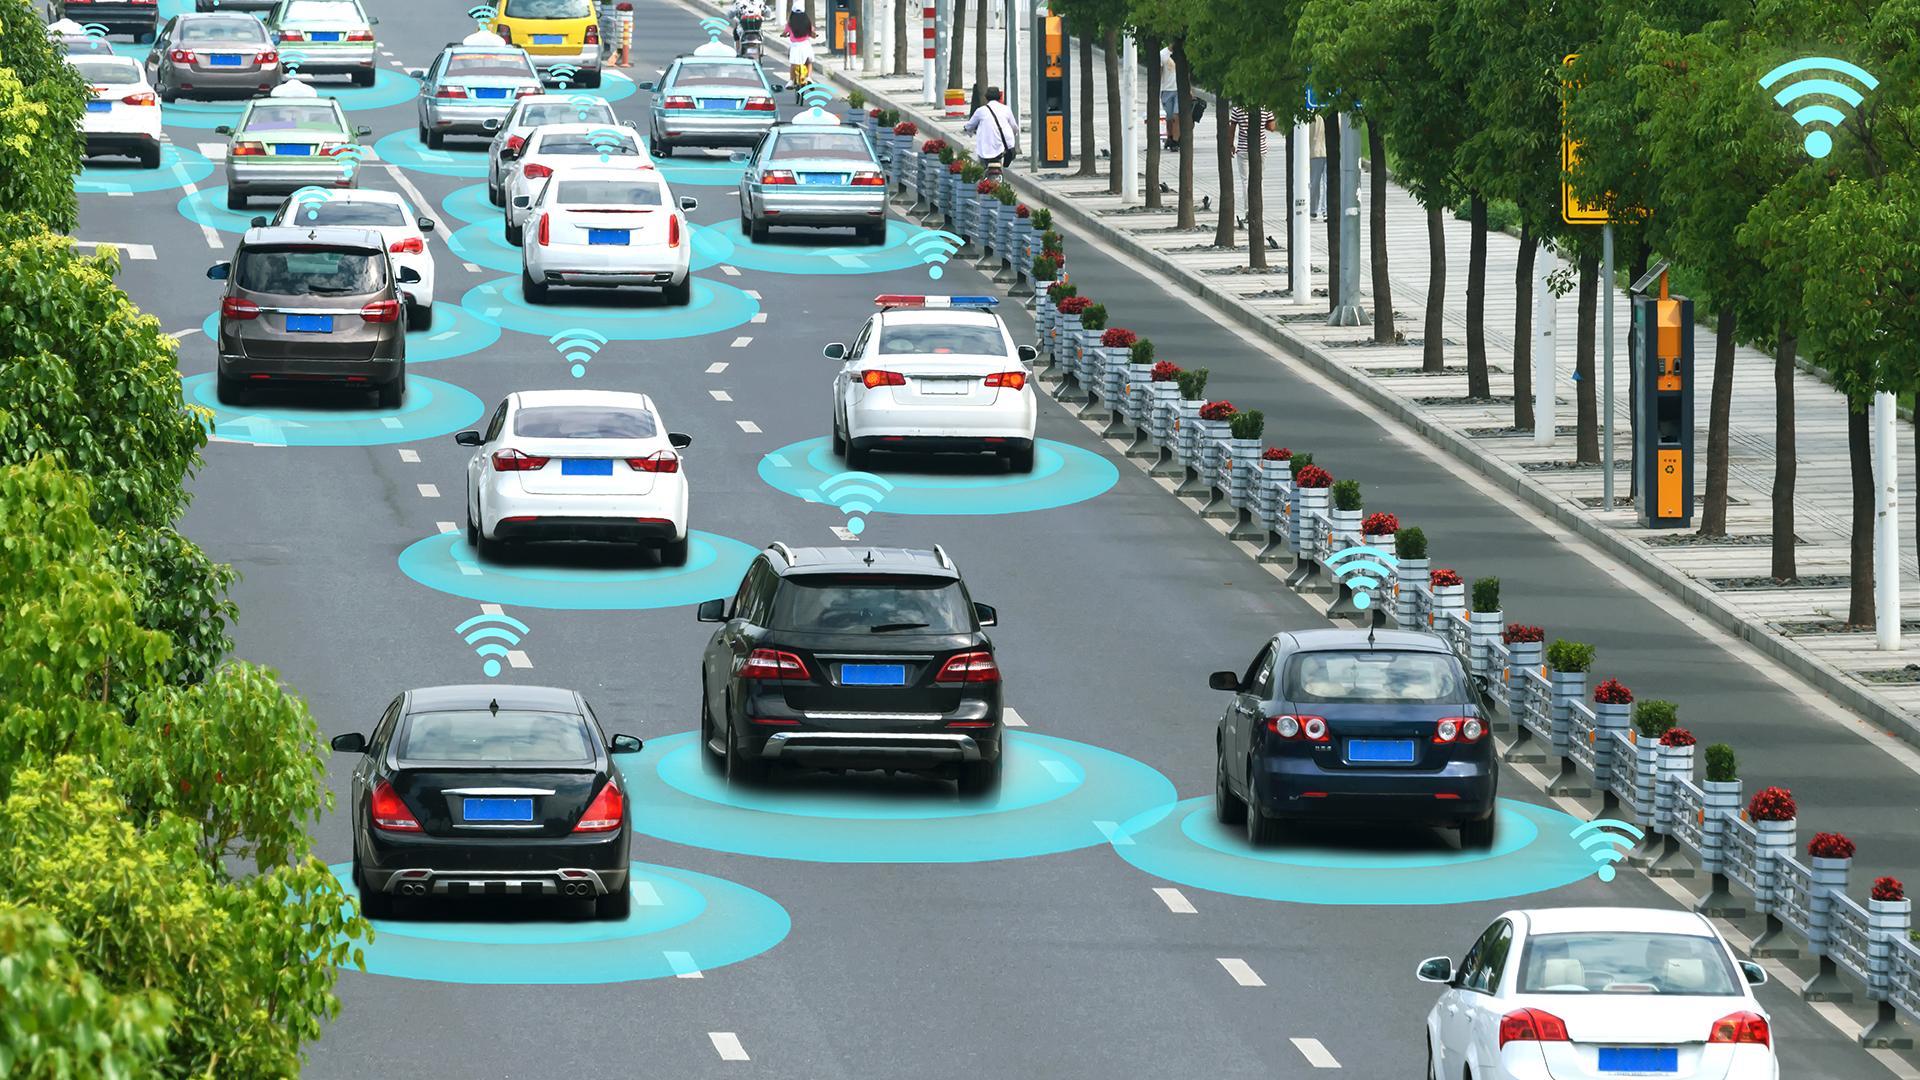 Top 3 Autonomous Driving Stocks To Buy | Seeking Alpha